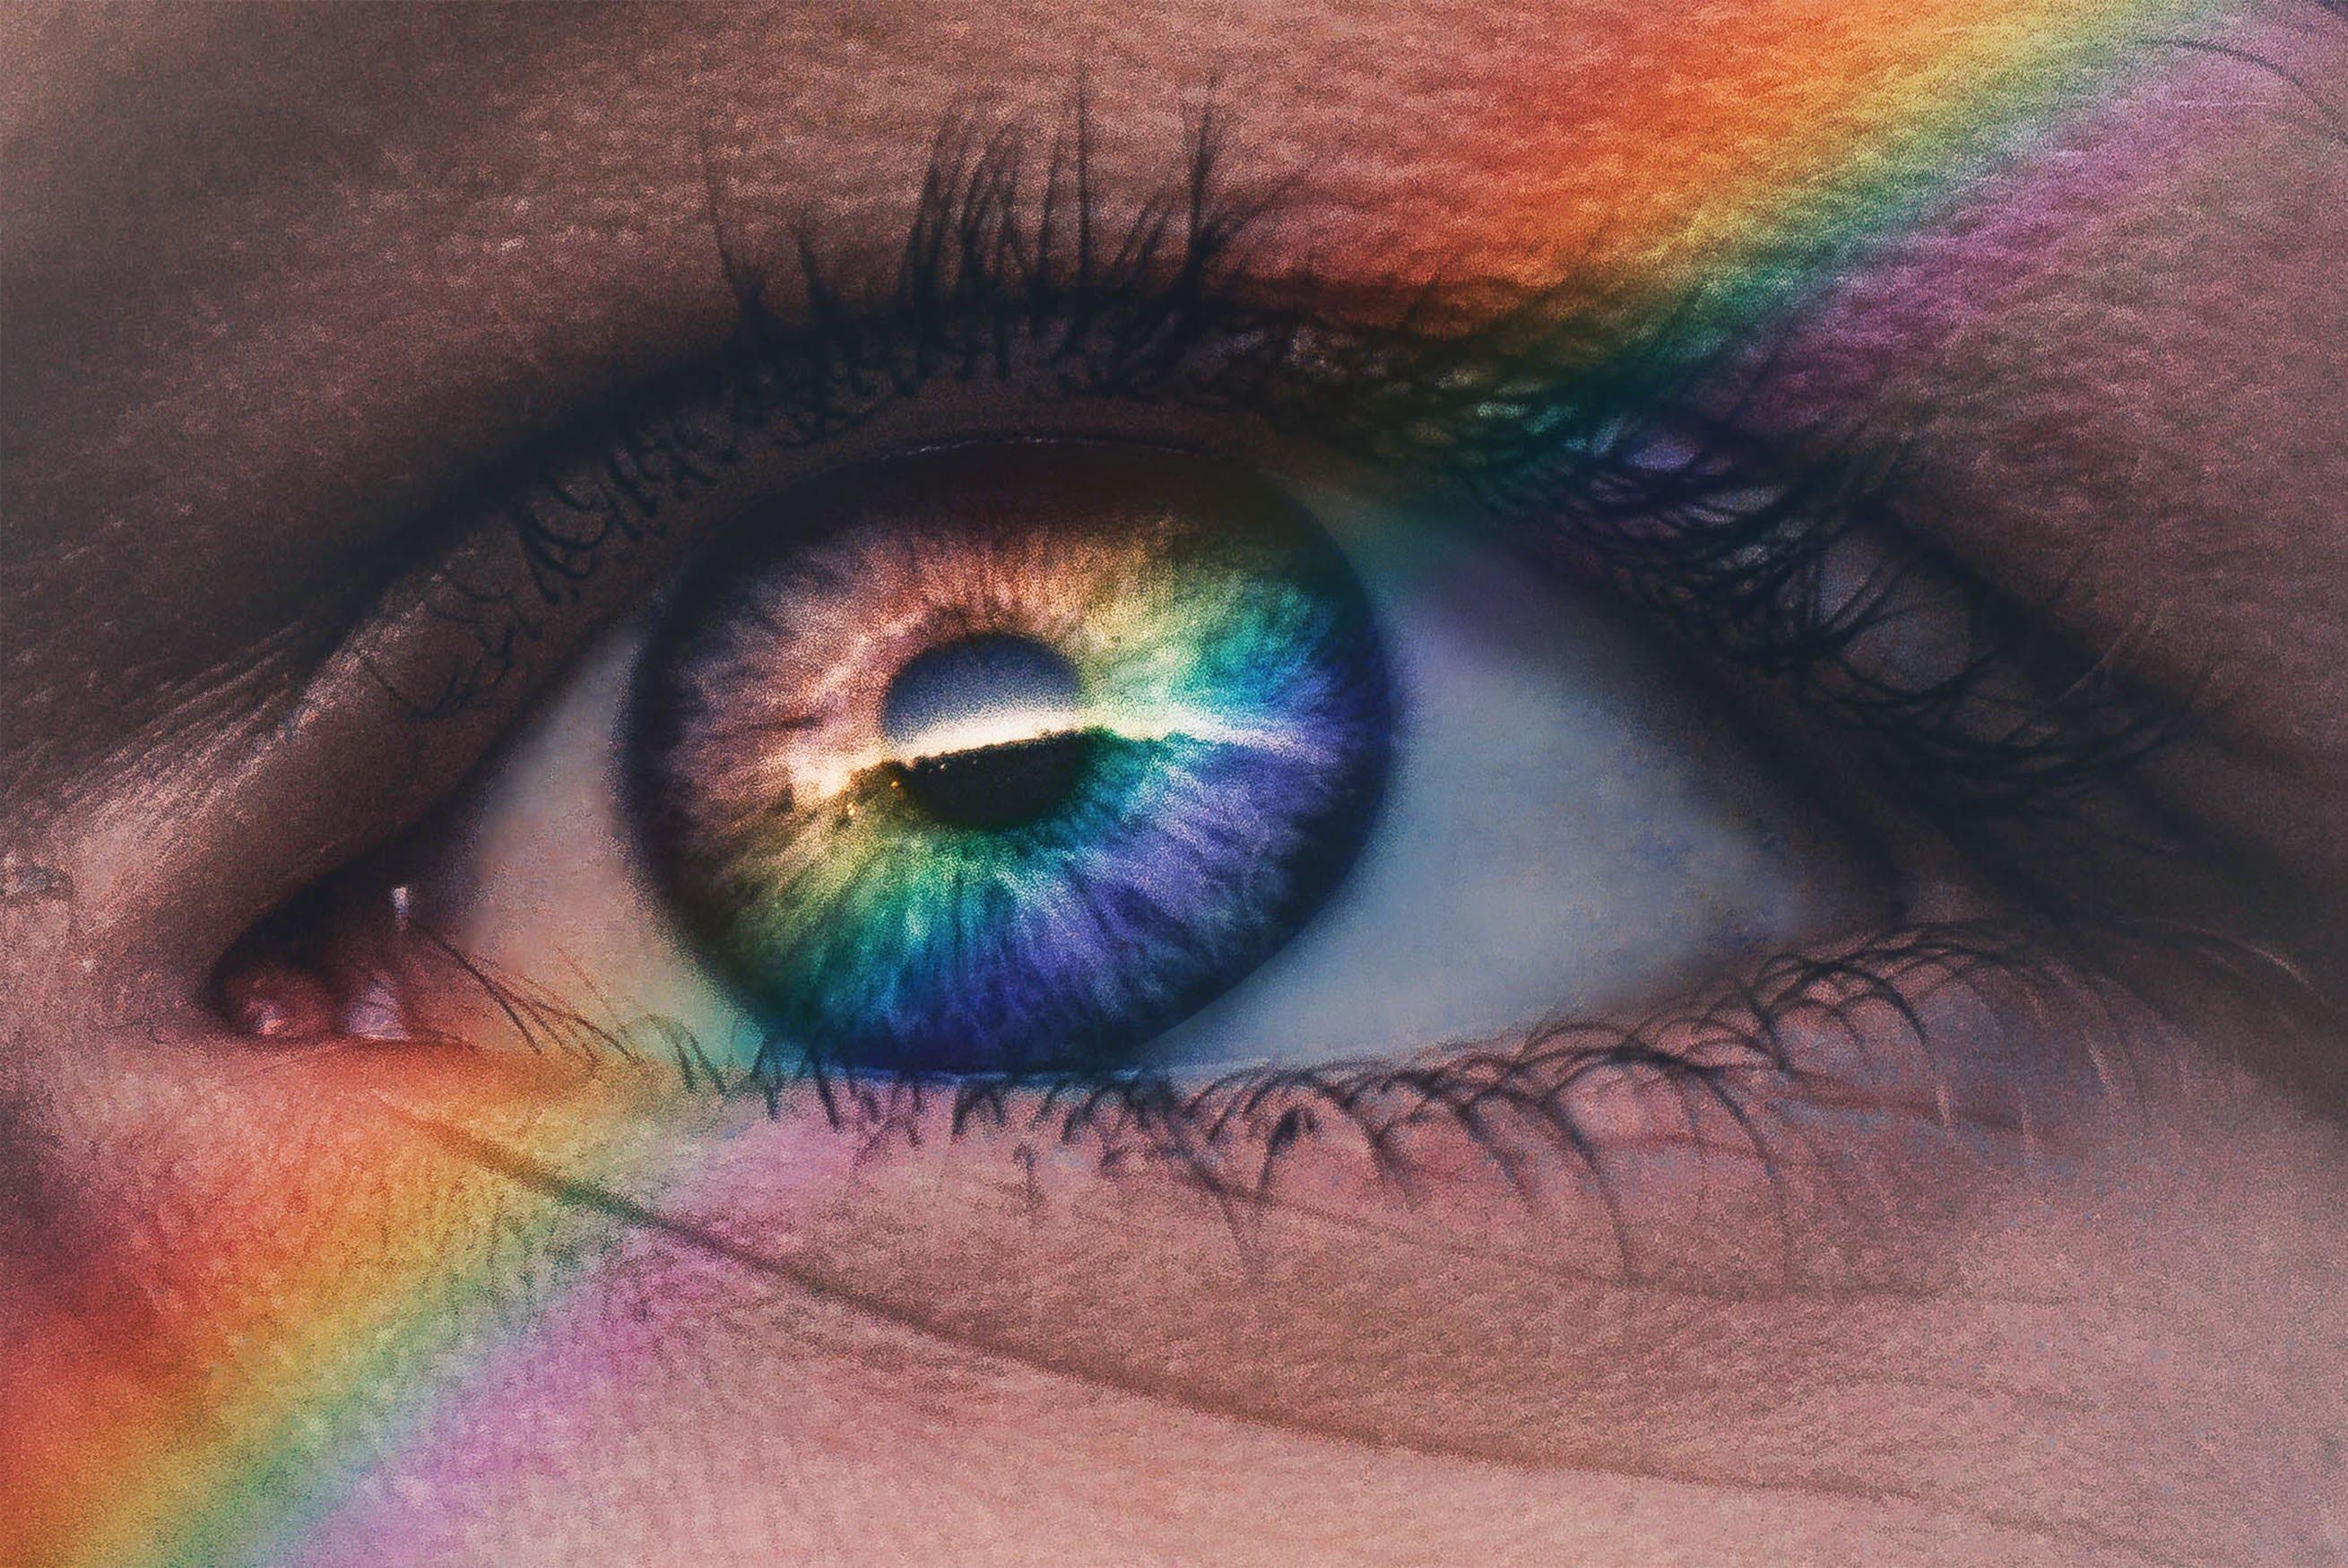 Laser eye surgery: seeing the benefits